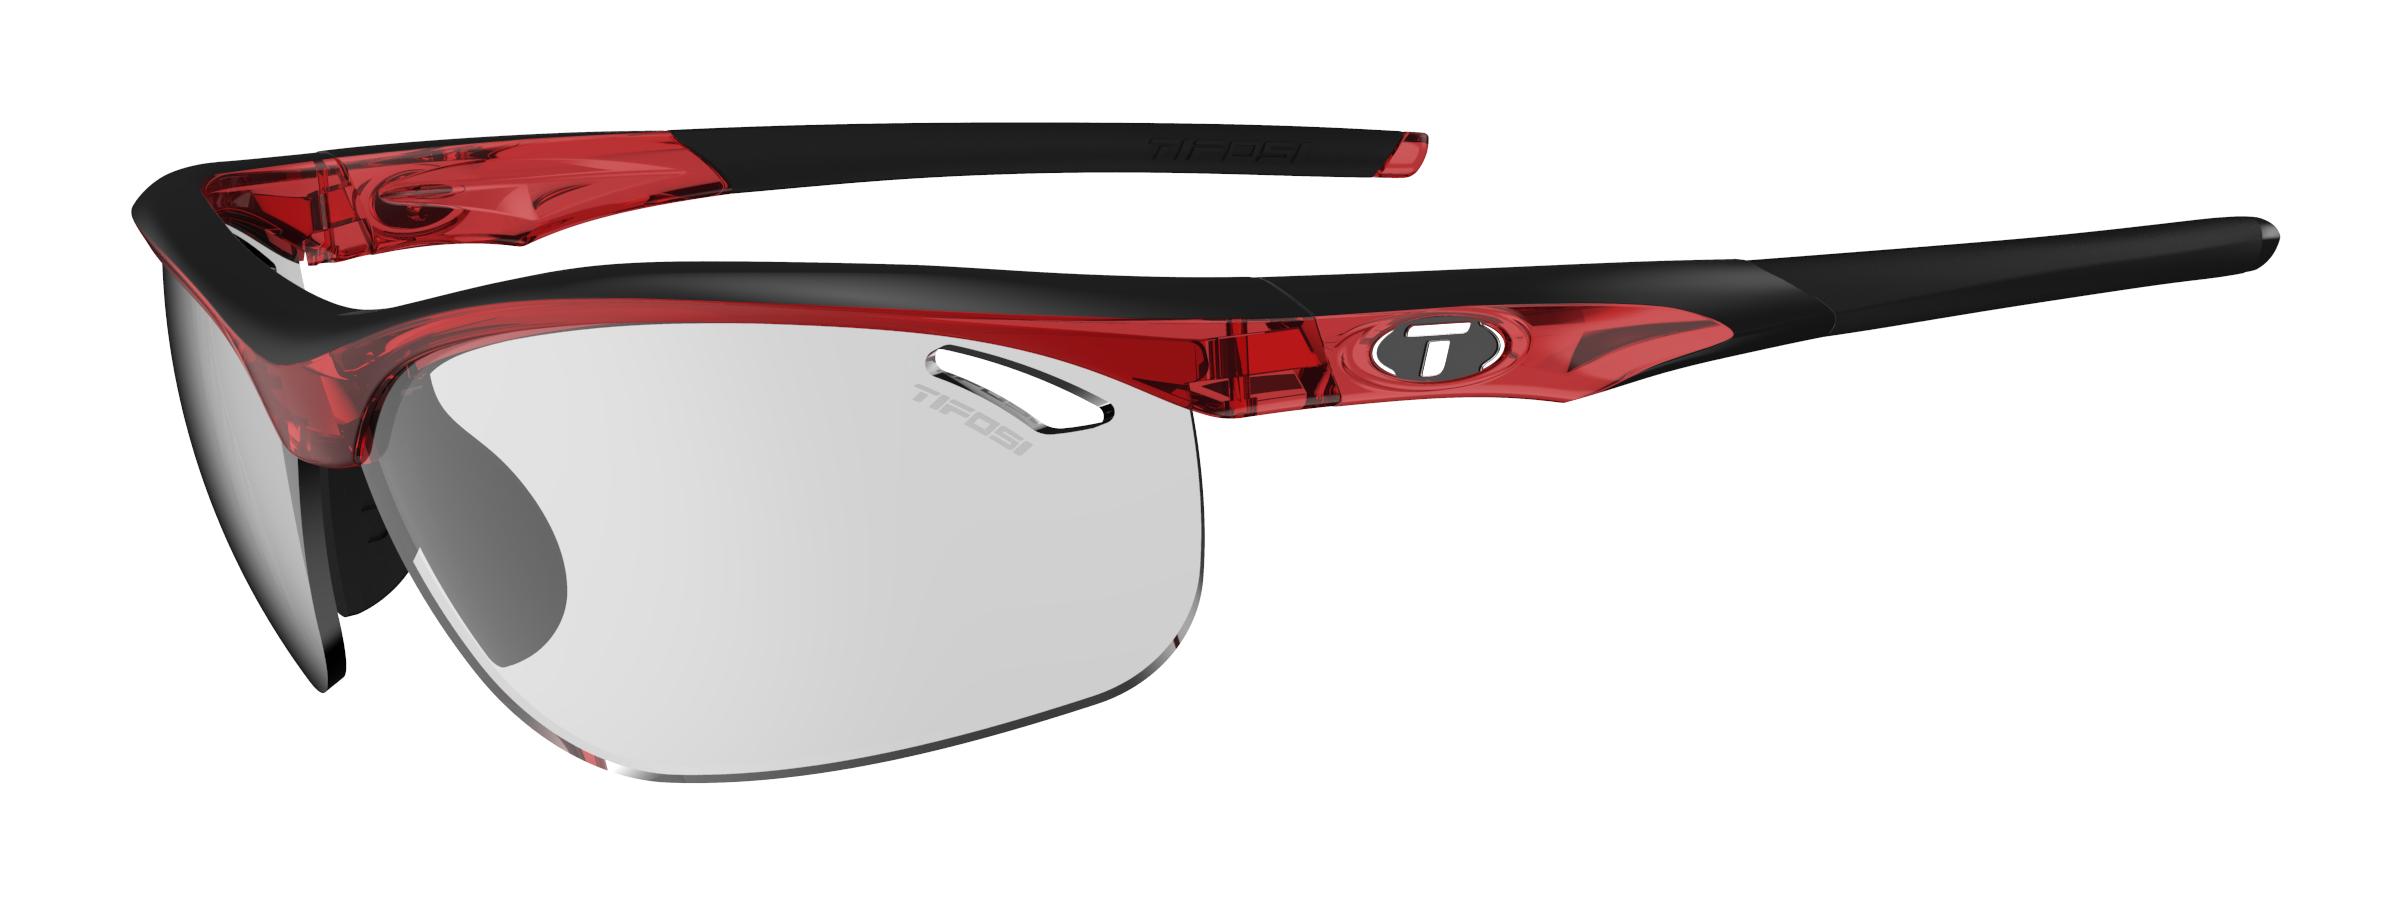 Tifosi Veloce Sunglasses Crystal Red w/ Smoke Fototec